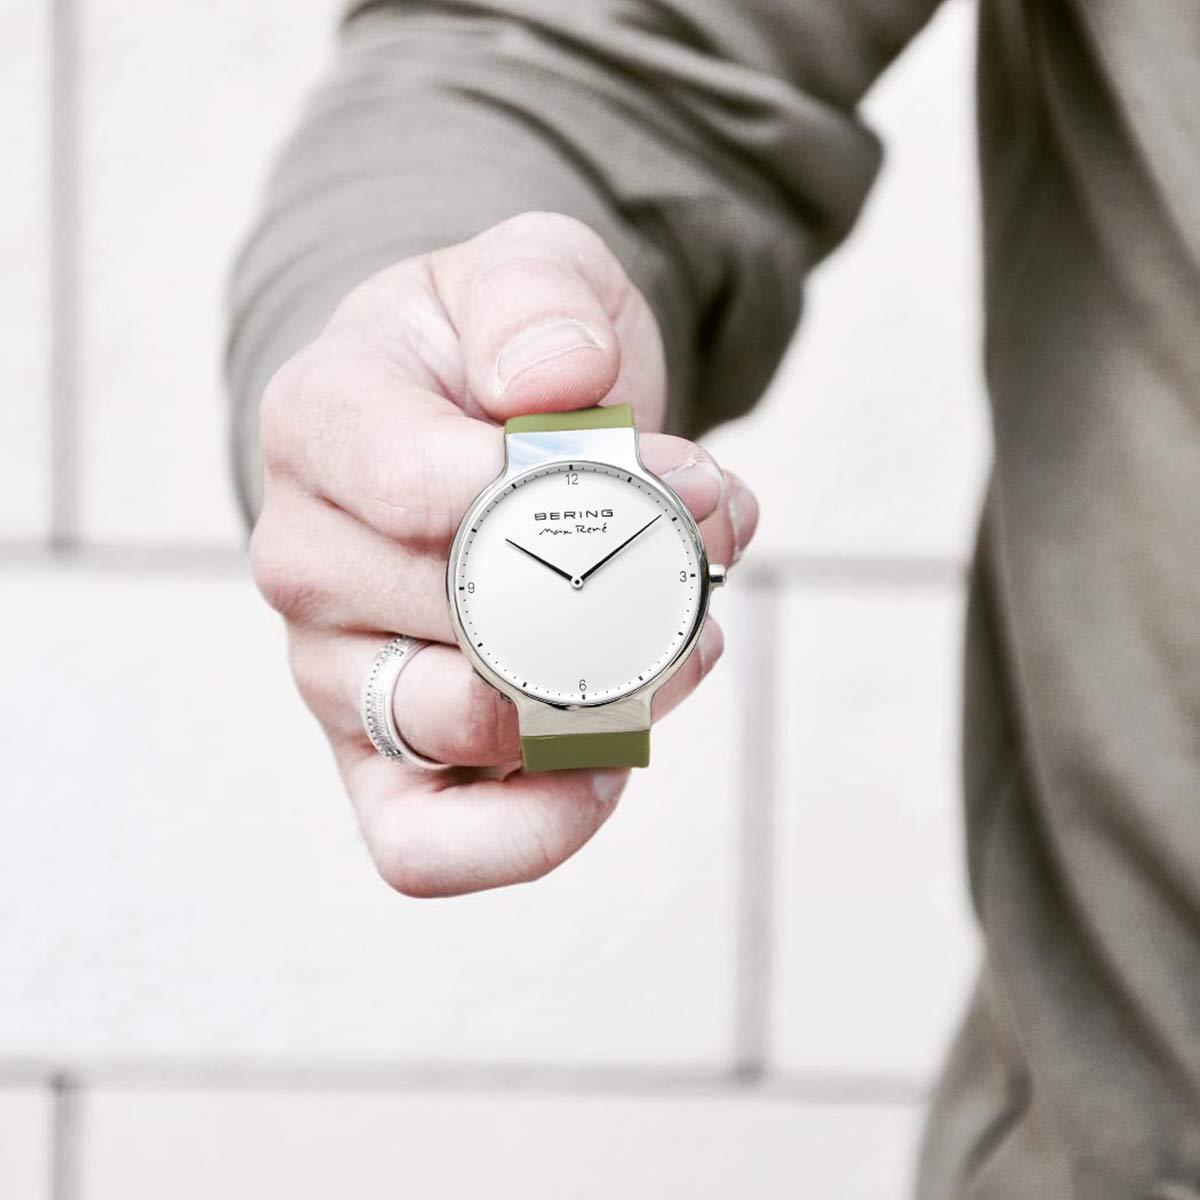 Analog Herren Quarz 800 Armbanduhr Silikon Bering 15540 D9IYeEHW2